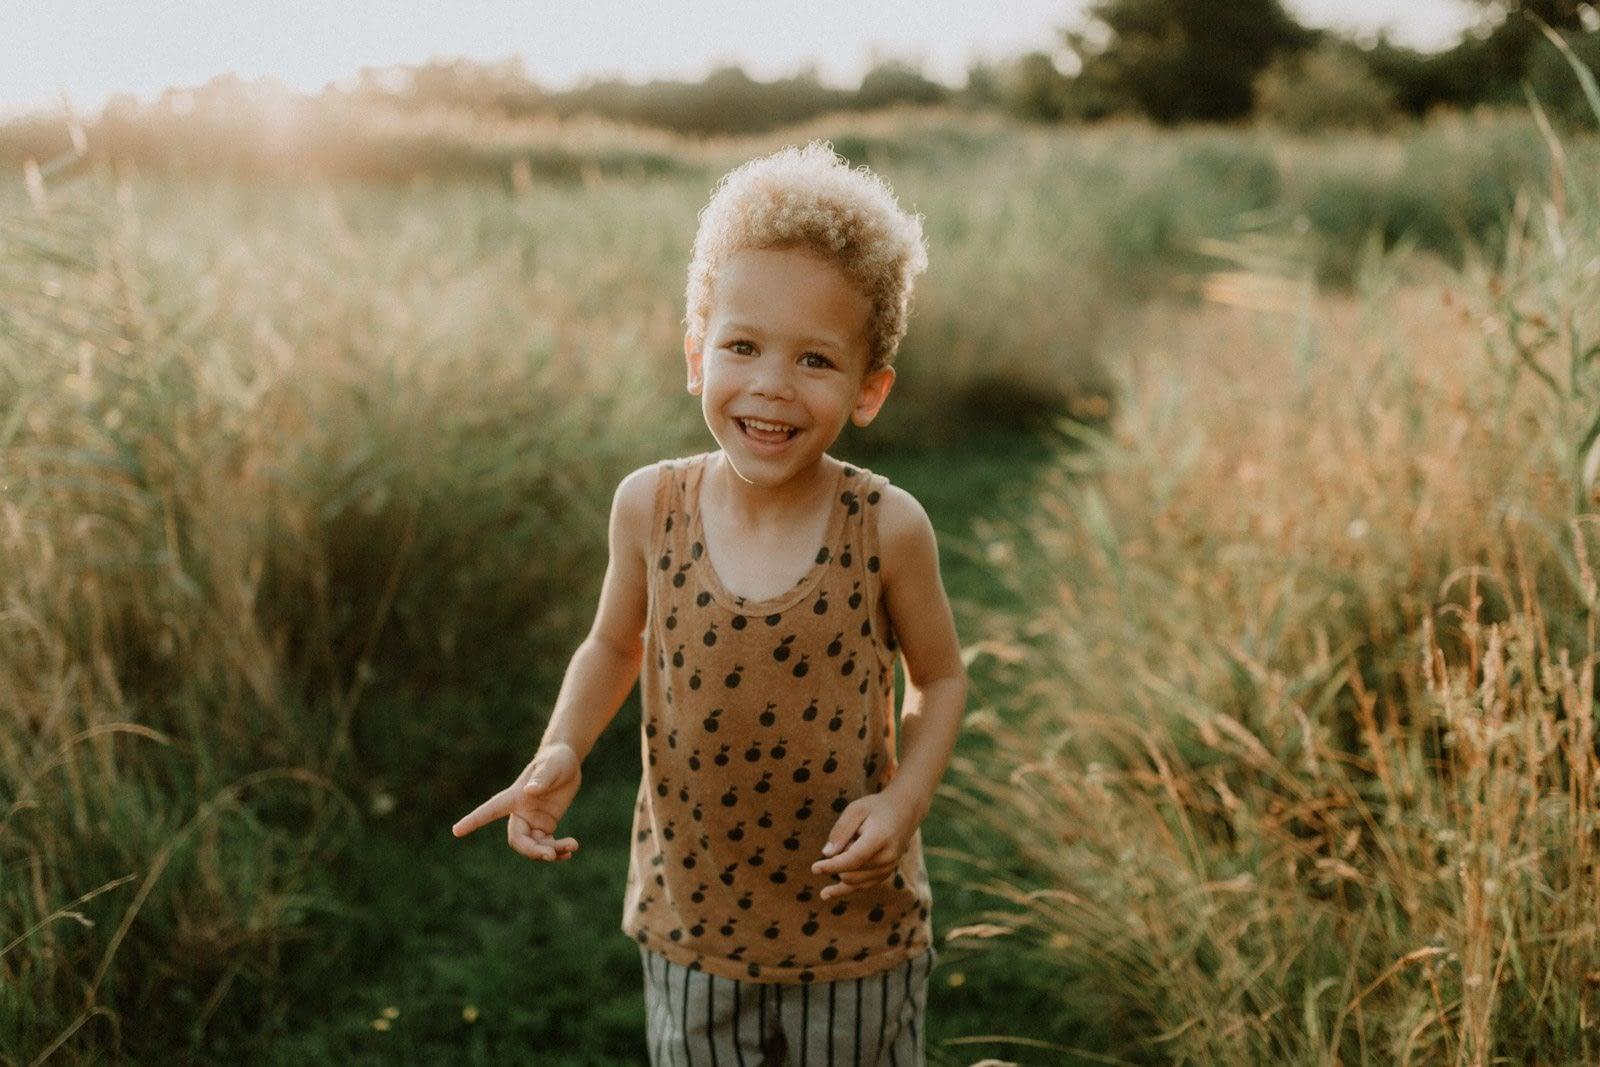 Gezinsfotoshoot Manon Engels Photography, gezinsfoto, kinderfotografie